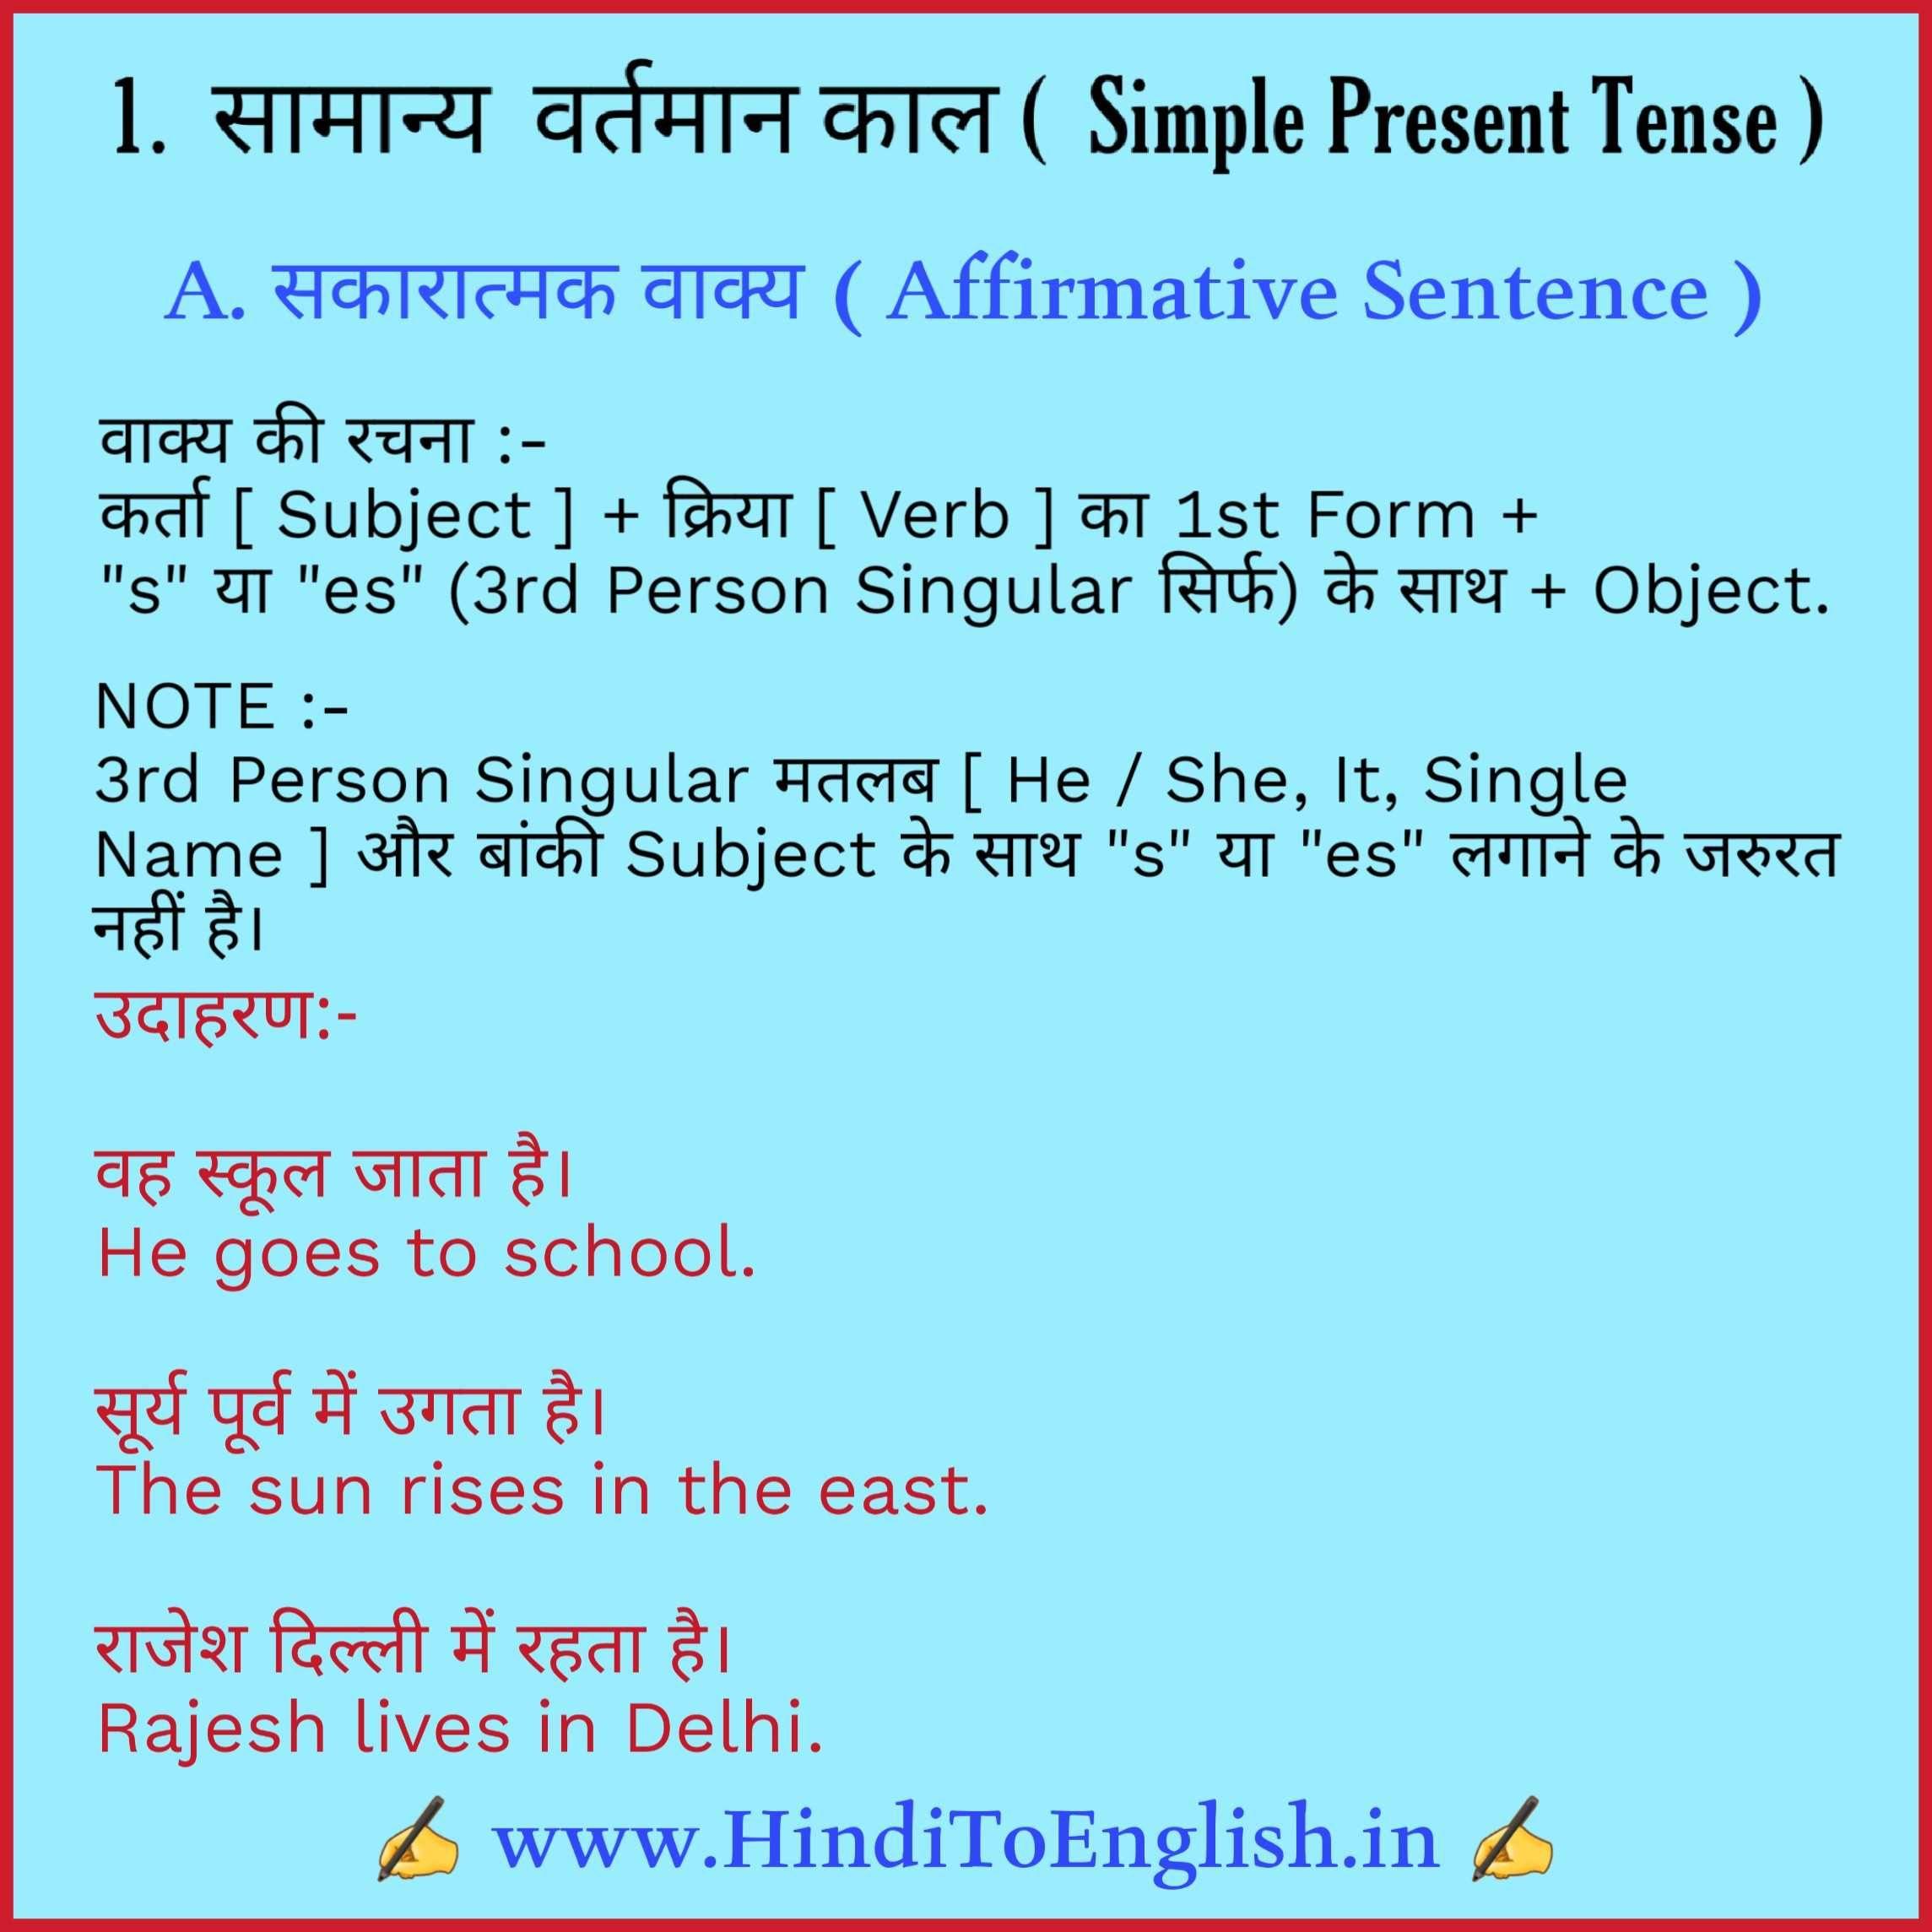 Tense In Hindi Tense In Hindi English Grammar Modals In Hindi In 2020 Simple Present Tense English Grammar Rules English Learning Spoken